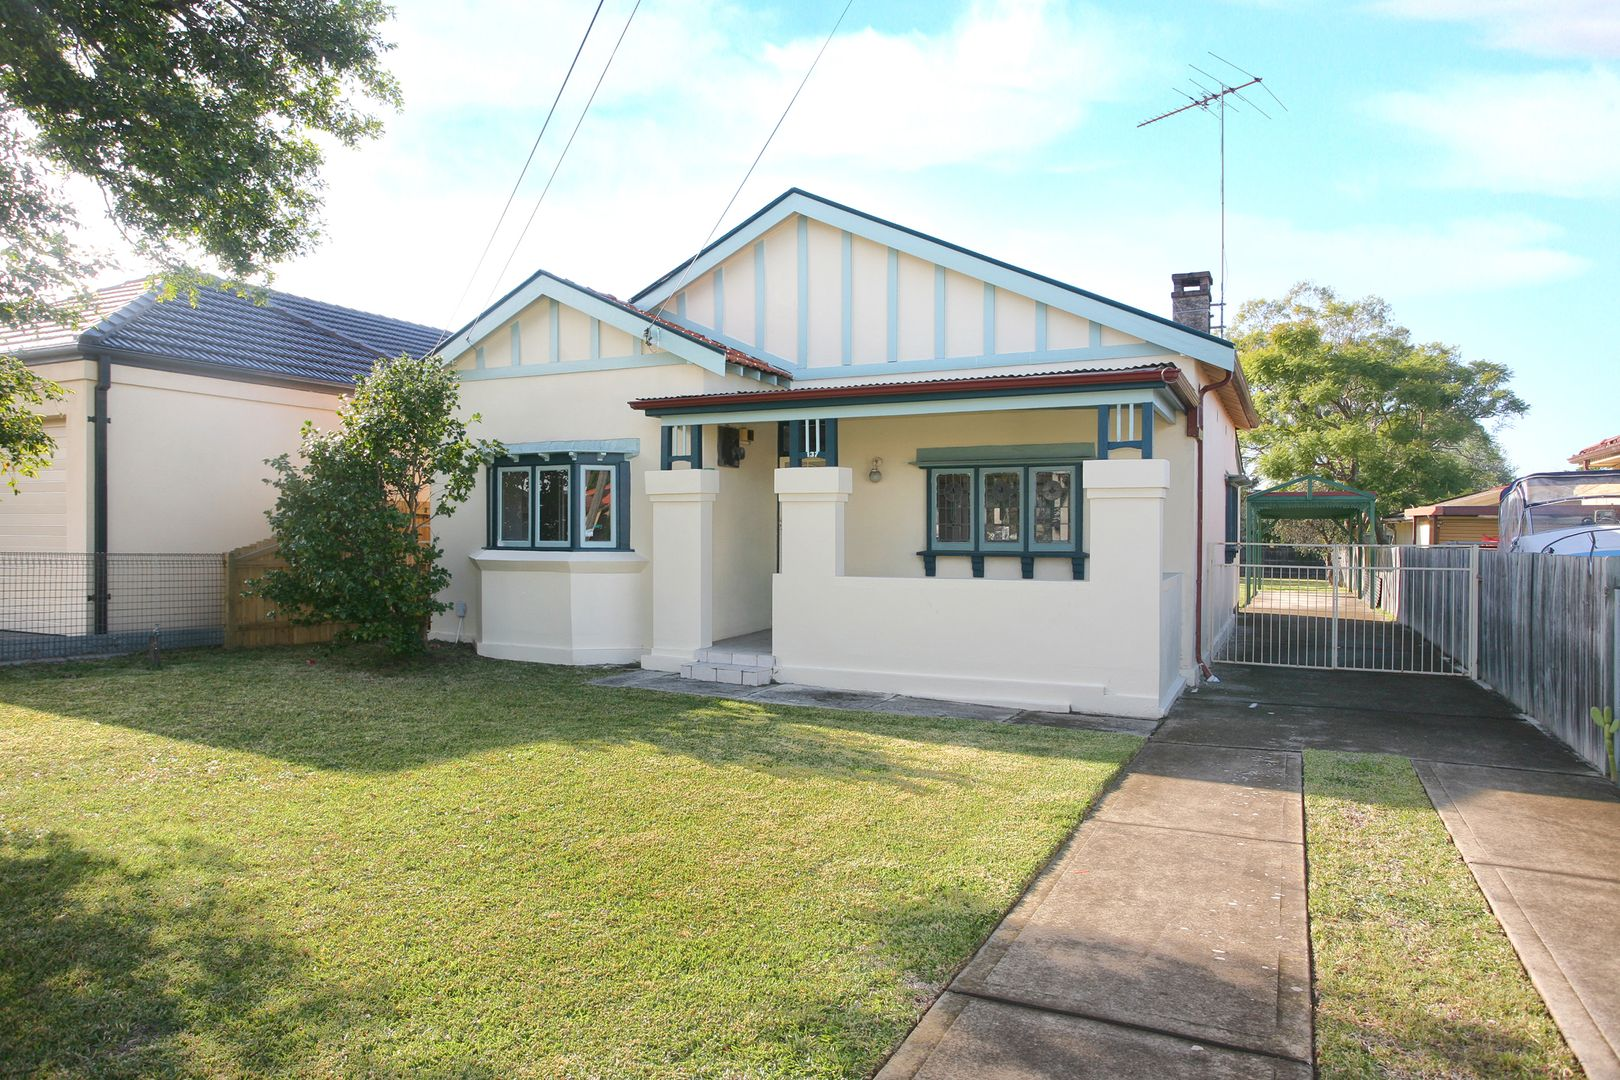 137 Cabarita  Road, Cabarita NSW 2137, Image 0